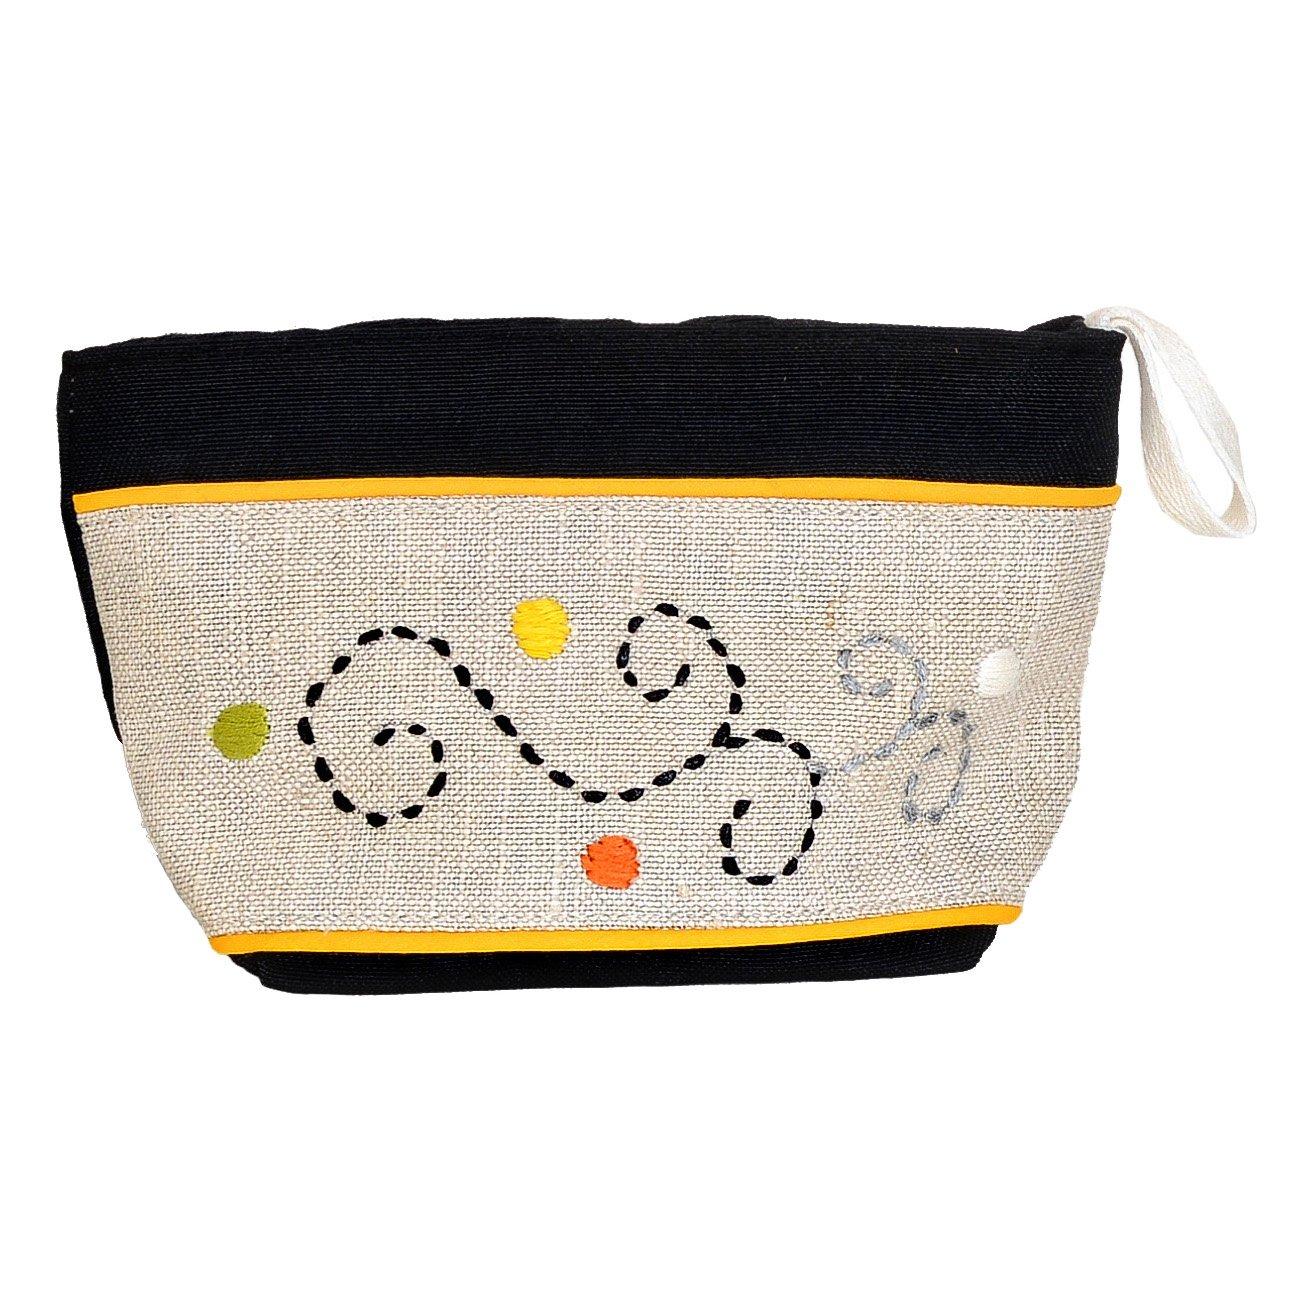 Madaraff Hand Embroidered Cotton Vanity Cosmetics Bag Large - Black